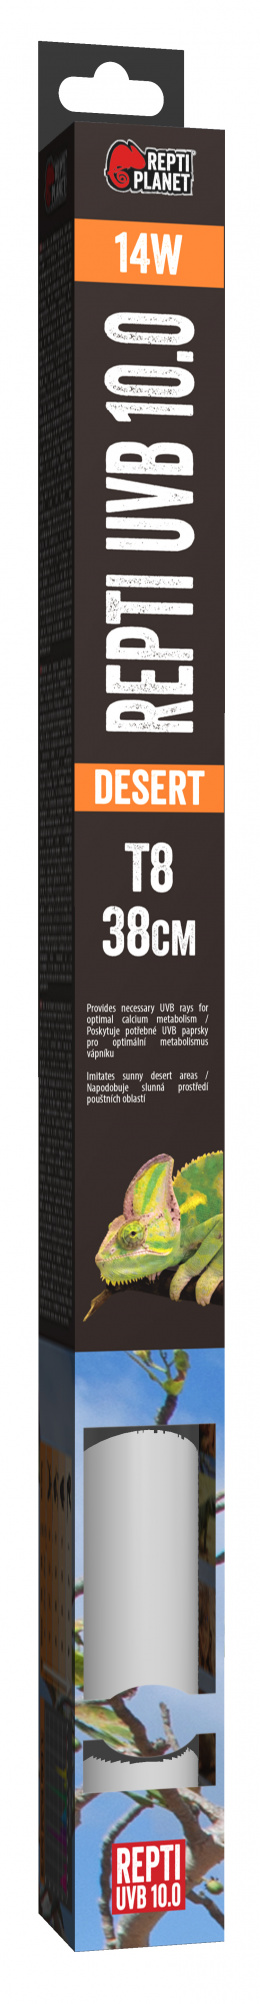 RP ziarivka Fluorescent UVB 10.0 38cm 14W